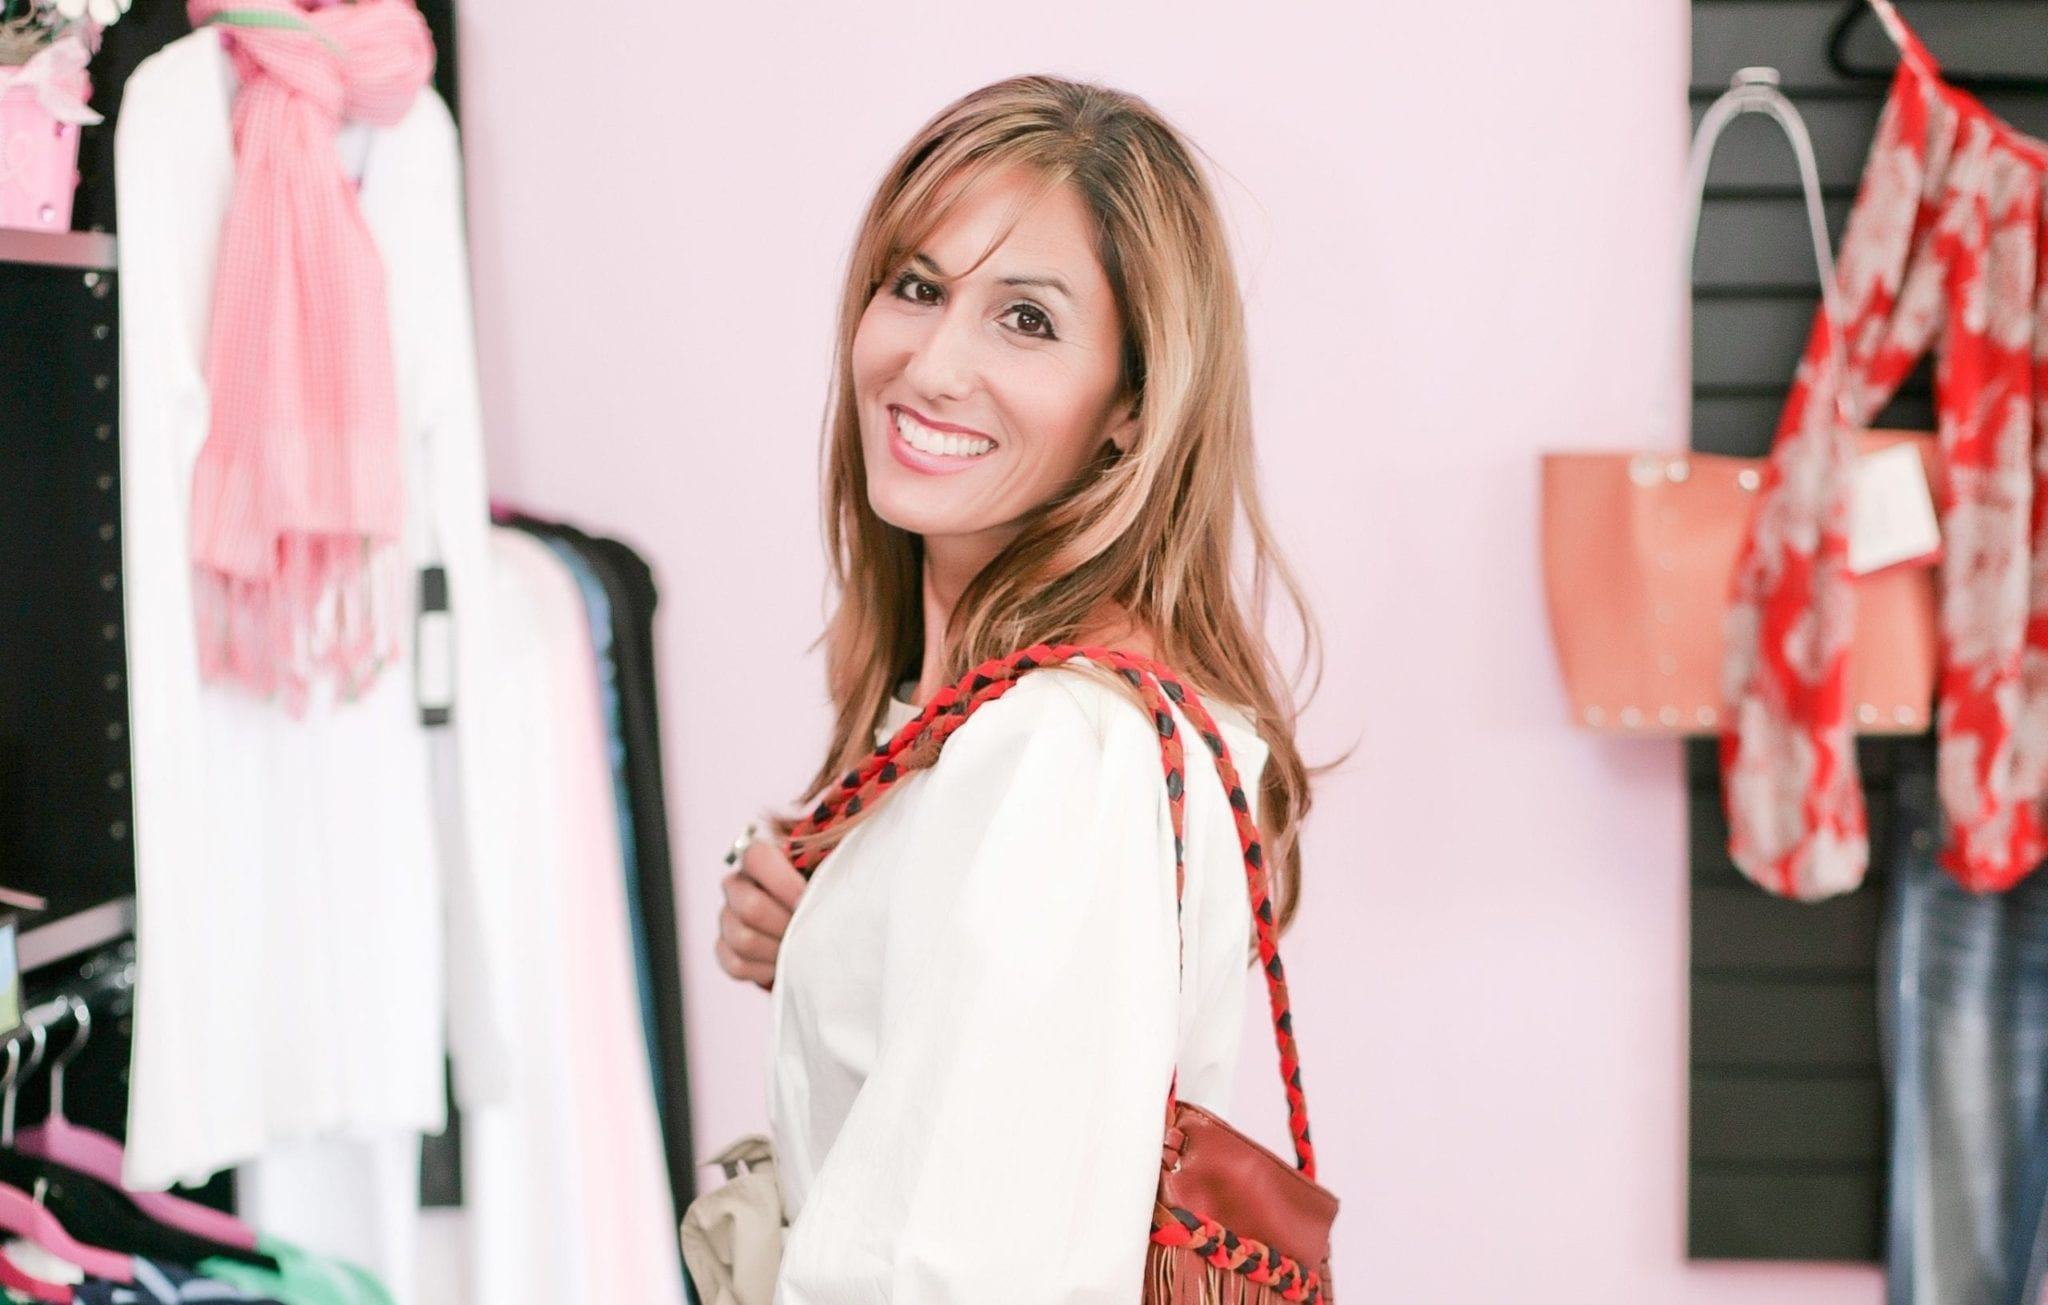 B'ville fashionista opens Mod Squad Fashions